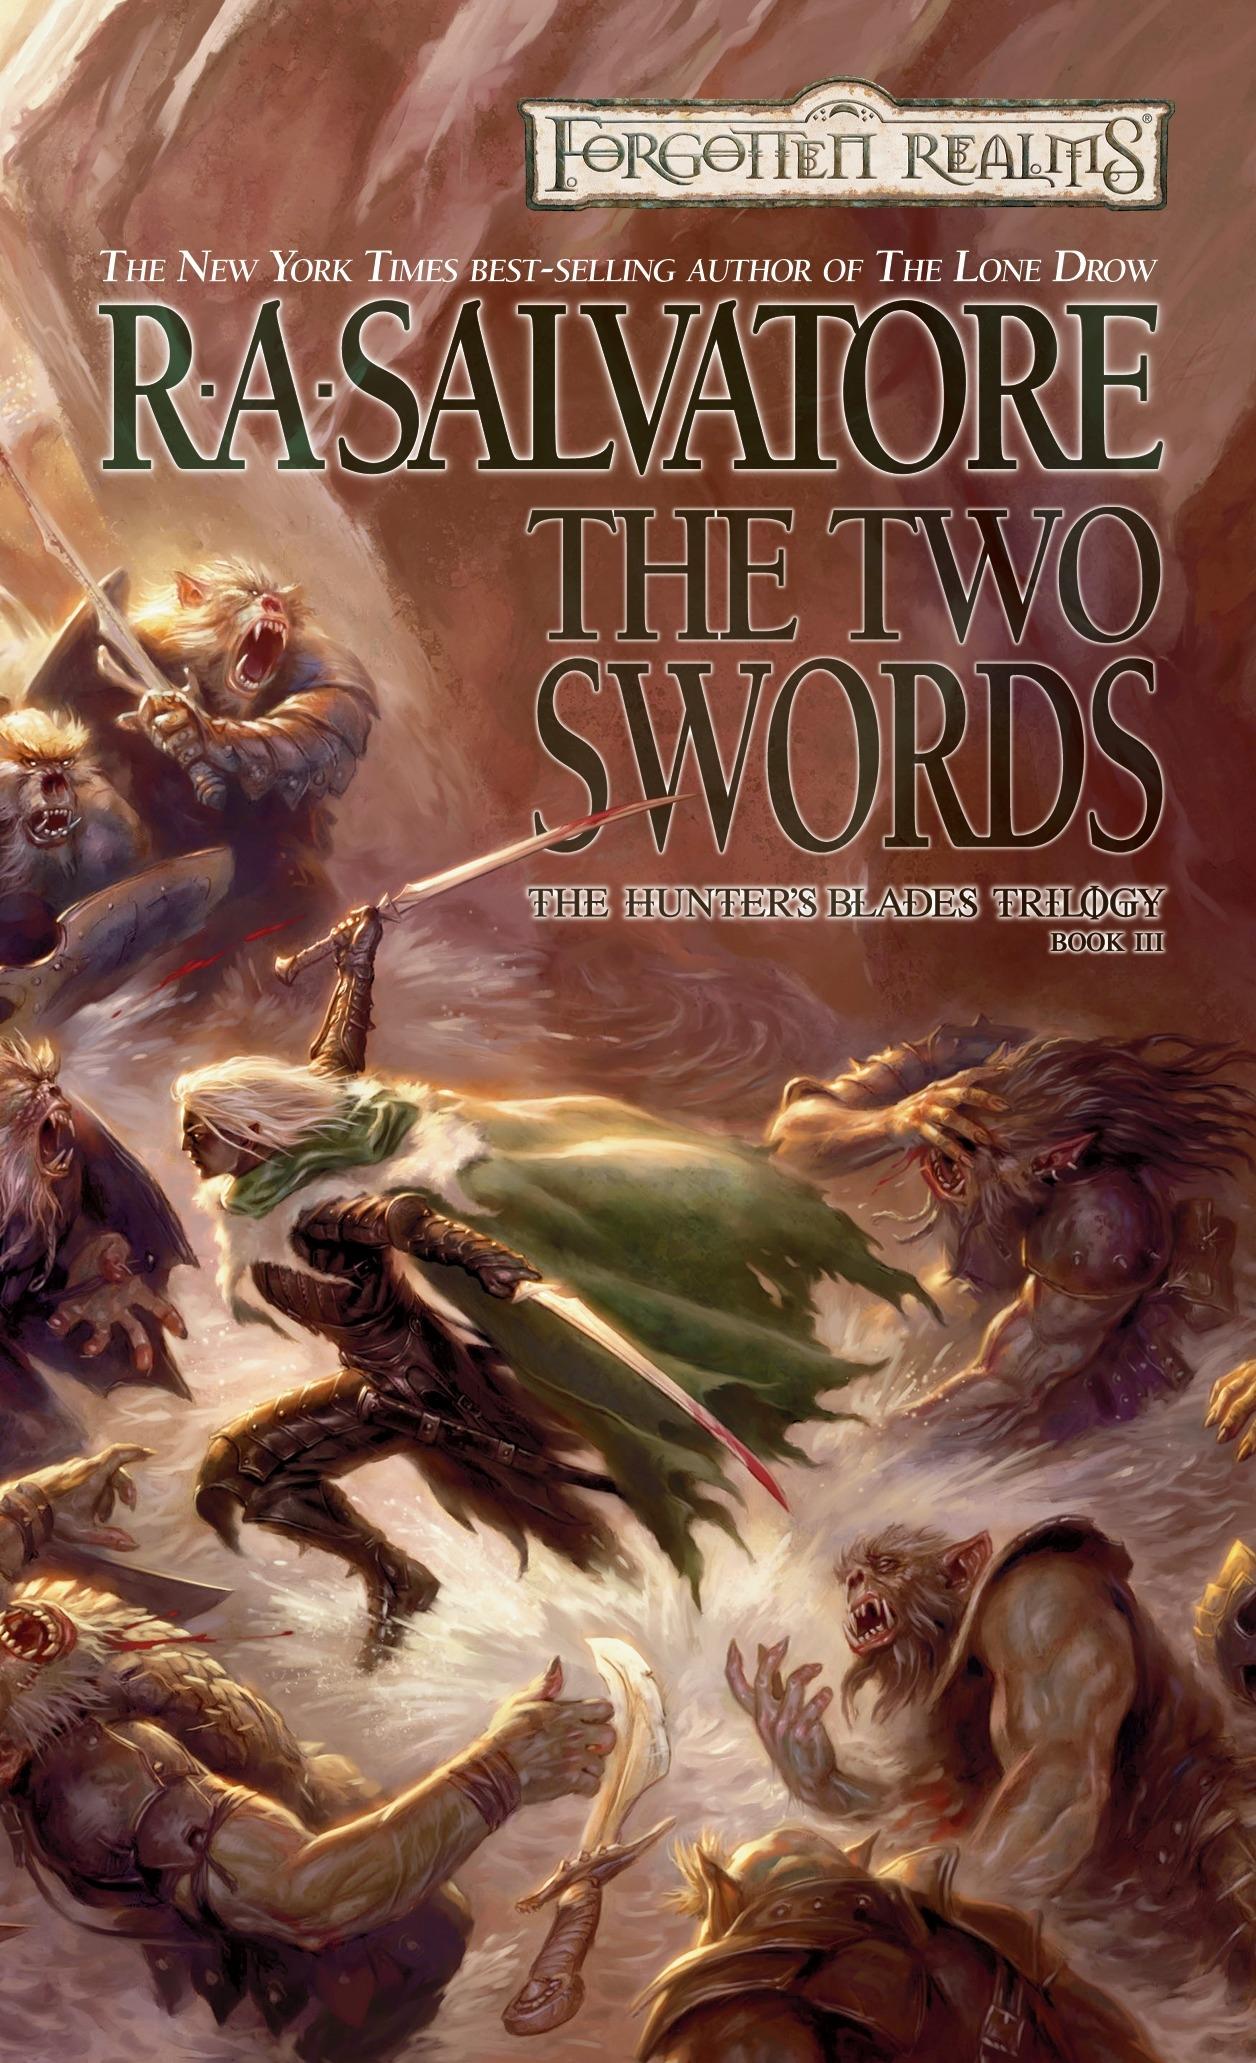 File:Two swords cover.jpg